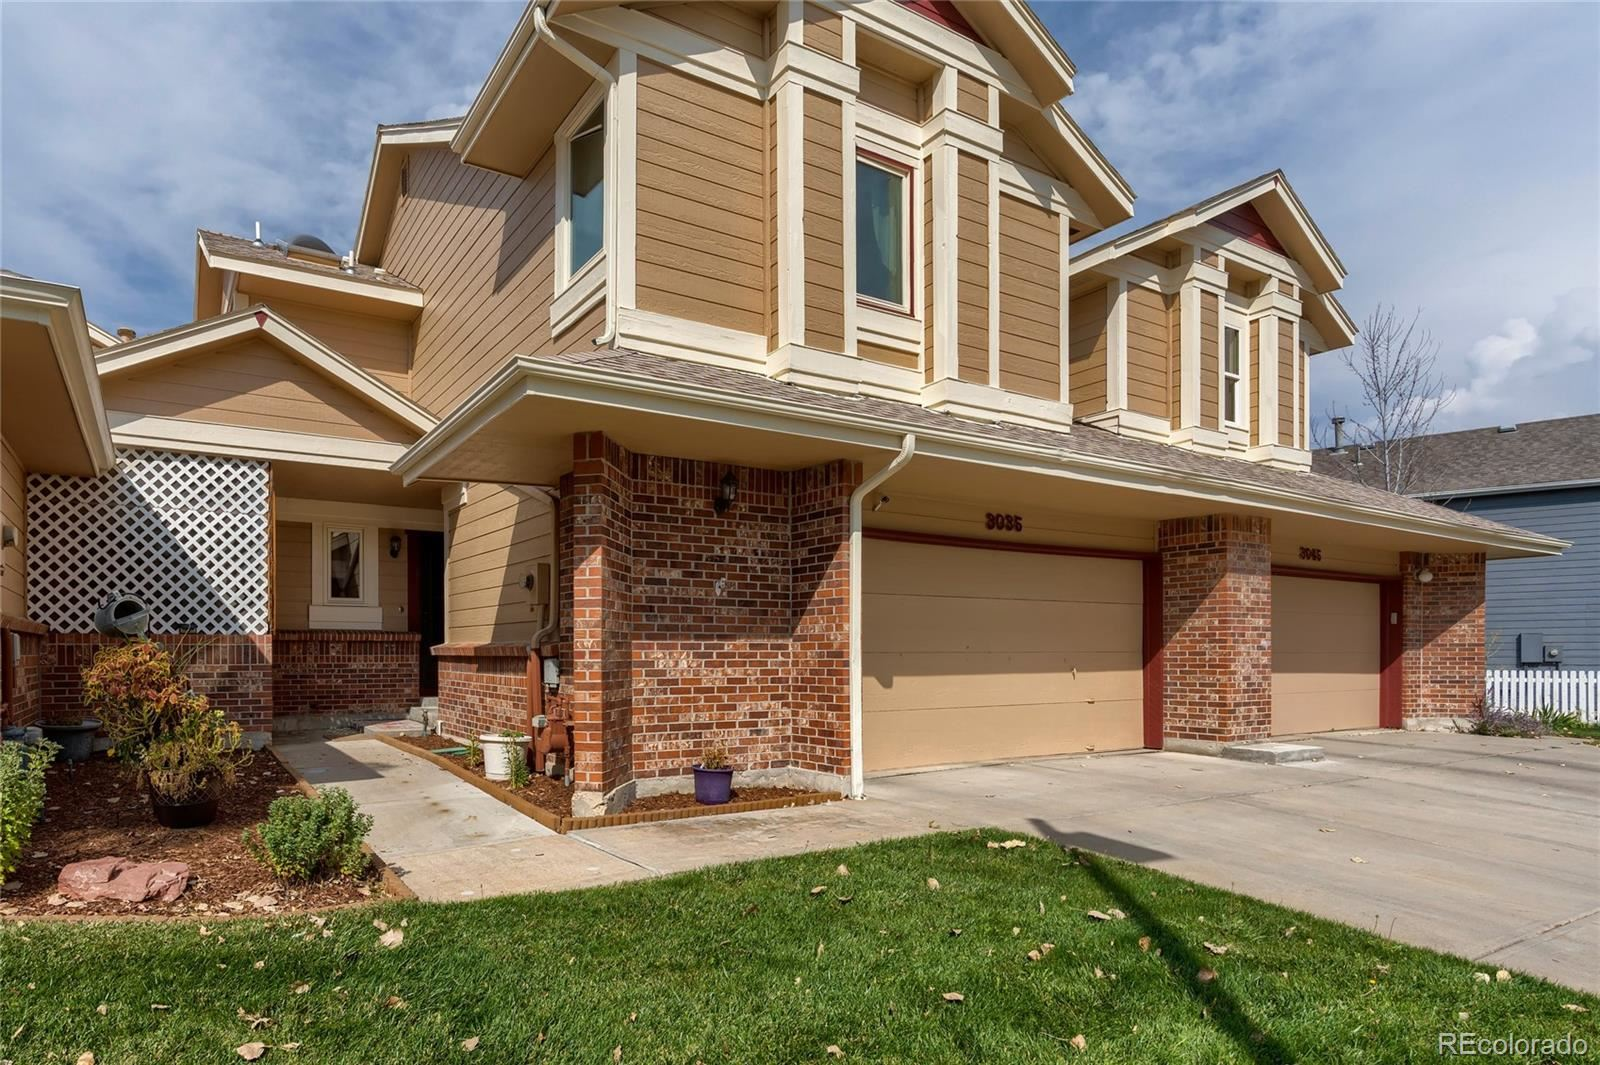 3035 E 133rd Circle, Thornton, CO 80241 - #: 2038638